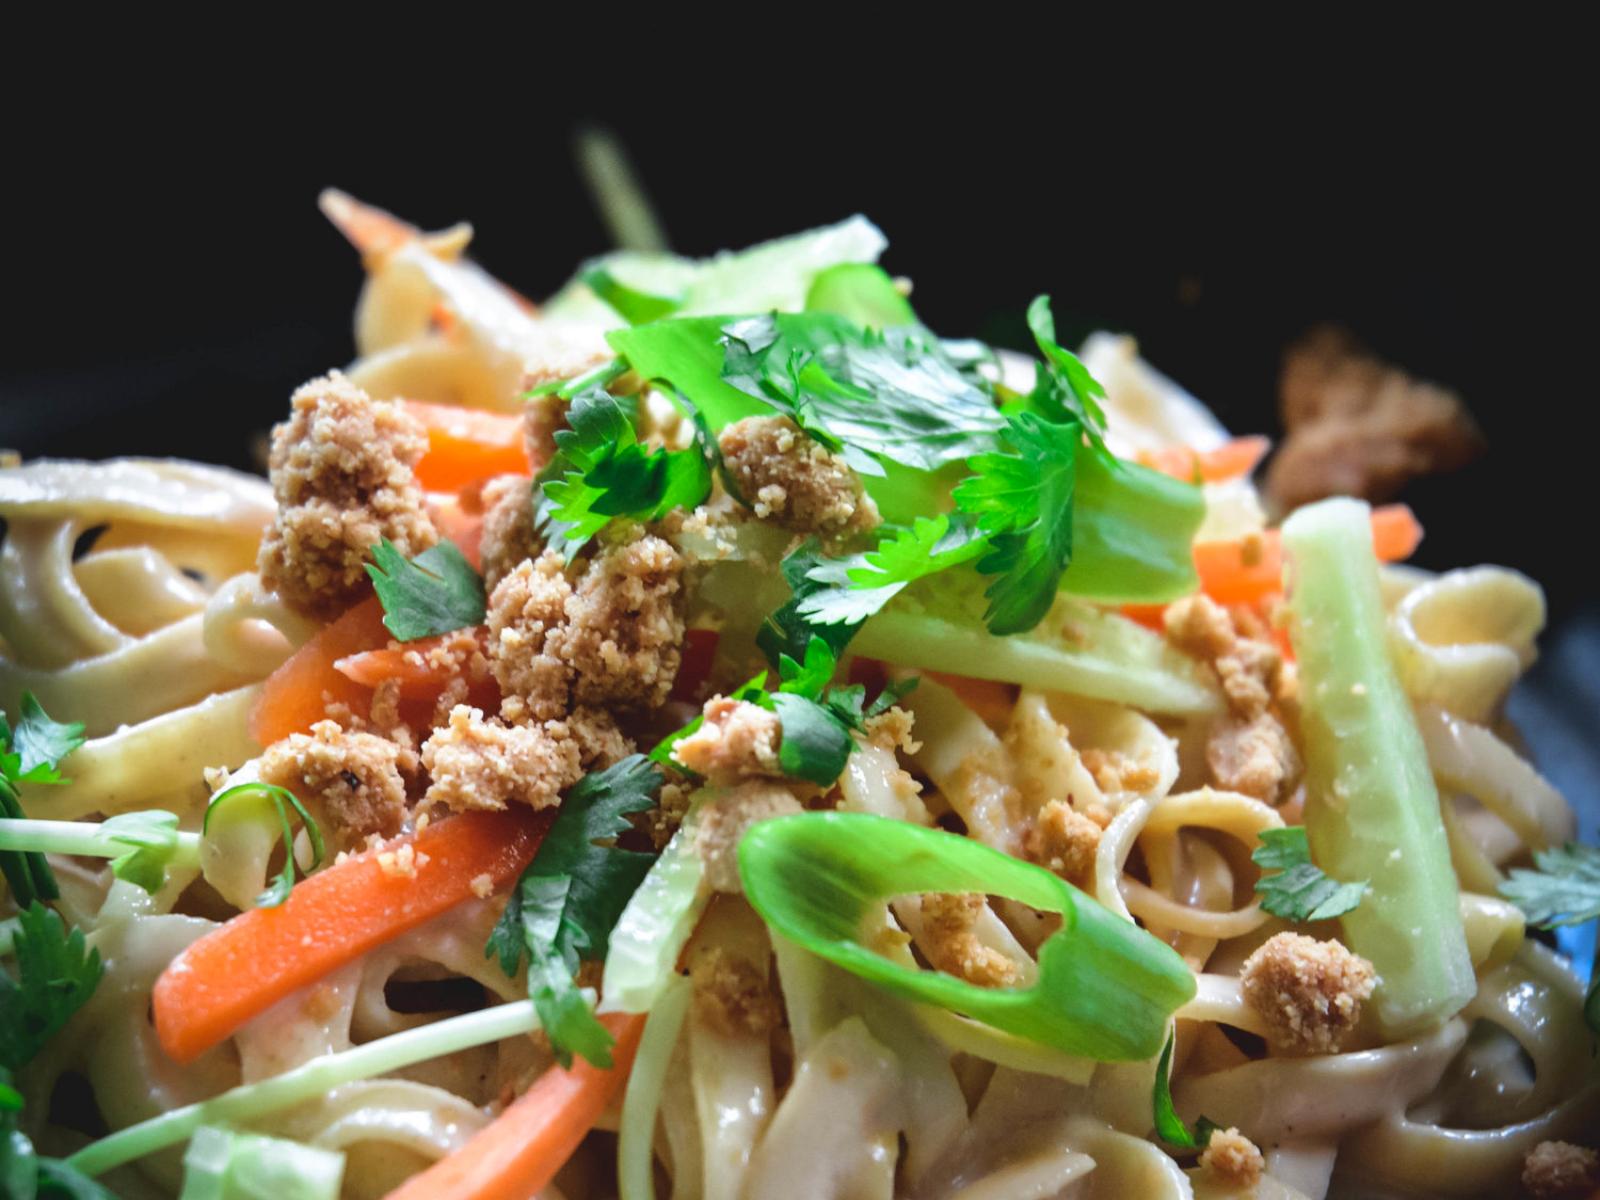 vegan rutabaga noodles